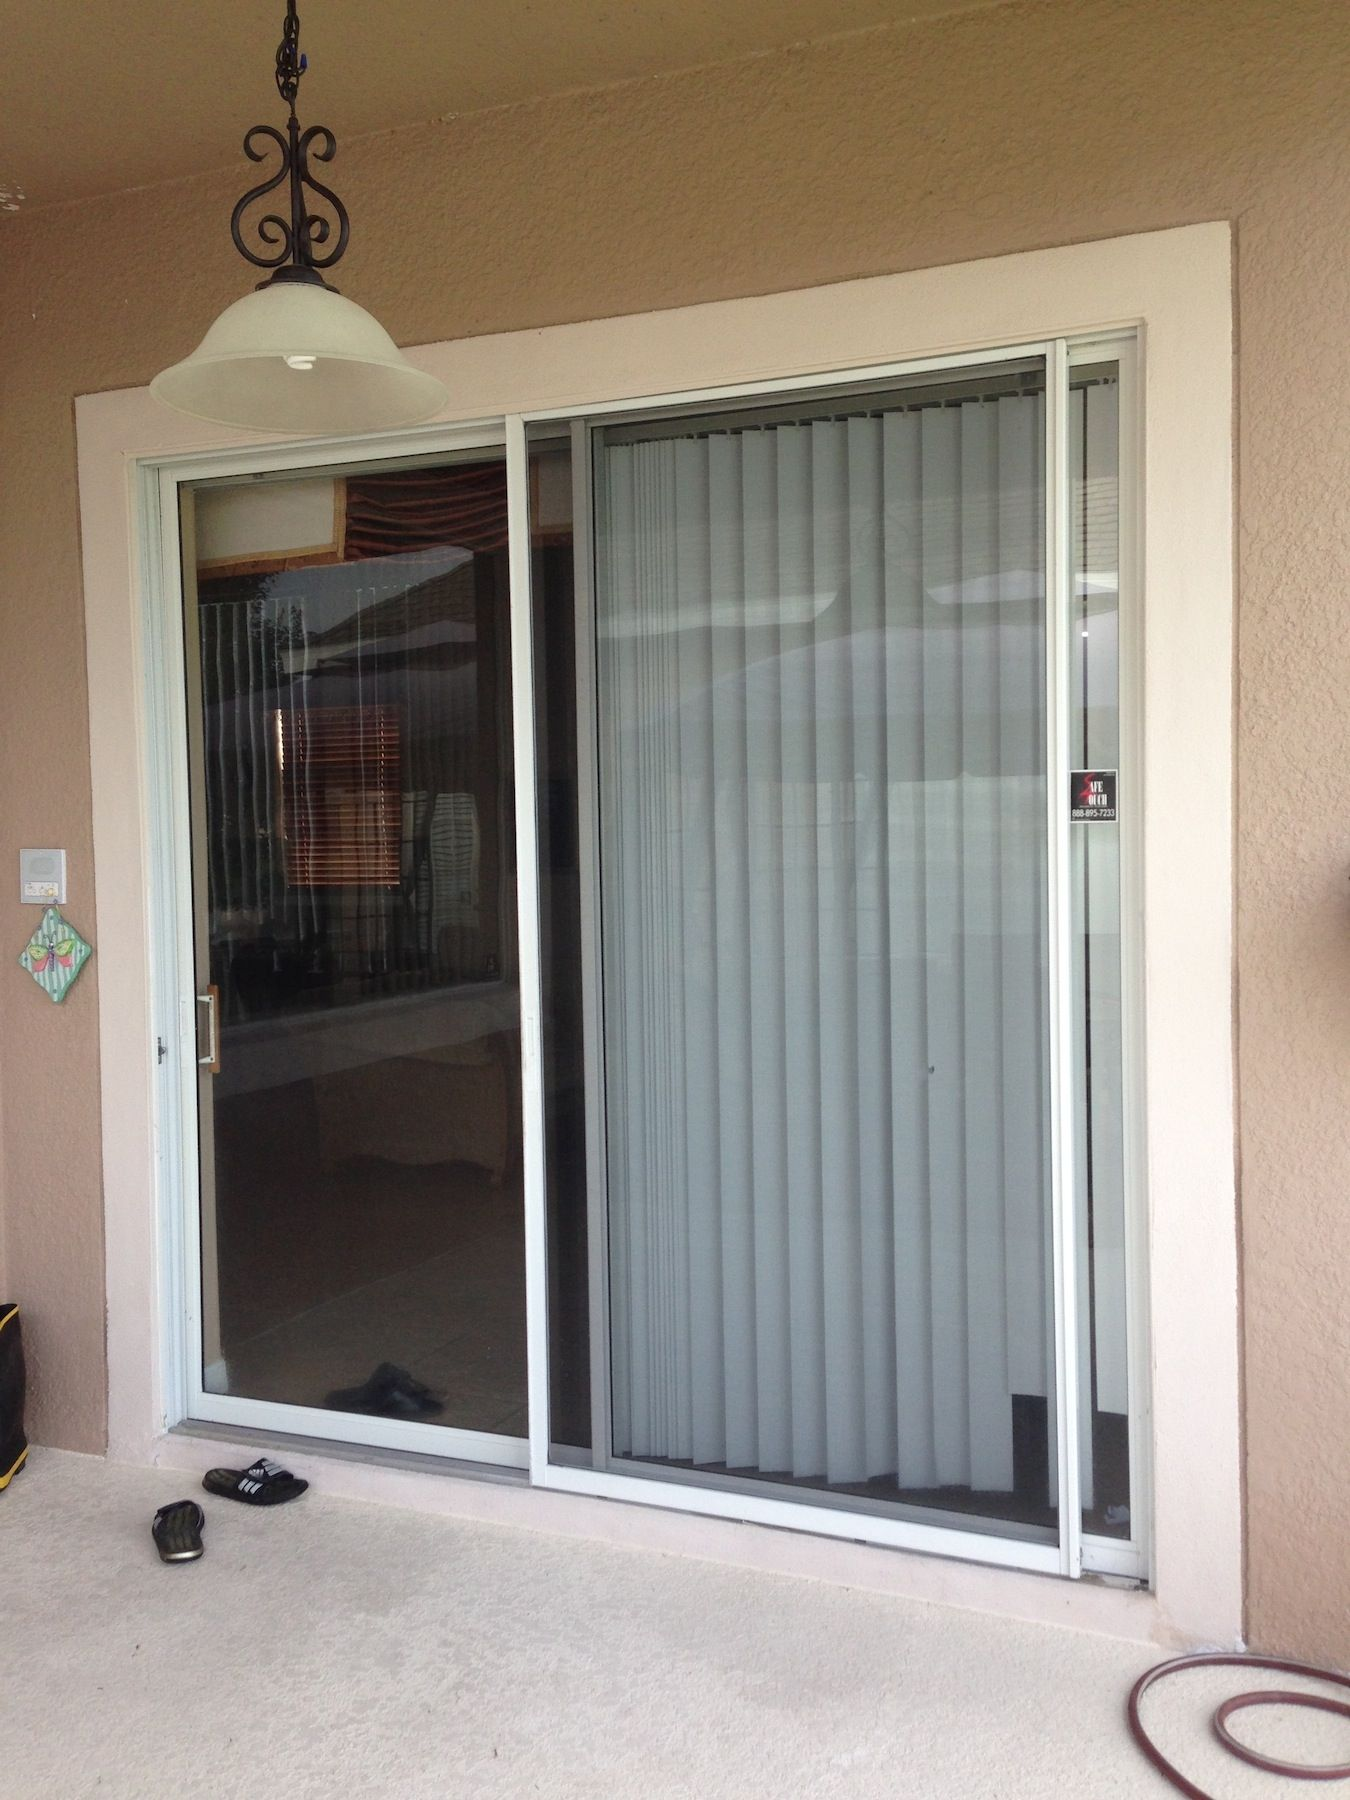 Privacy Window Film For Sliding Glass Doors Sliding Glass Doors Patio Glass Doors Patio Sliding Patio Doors